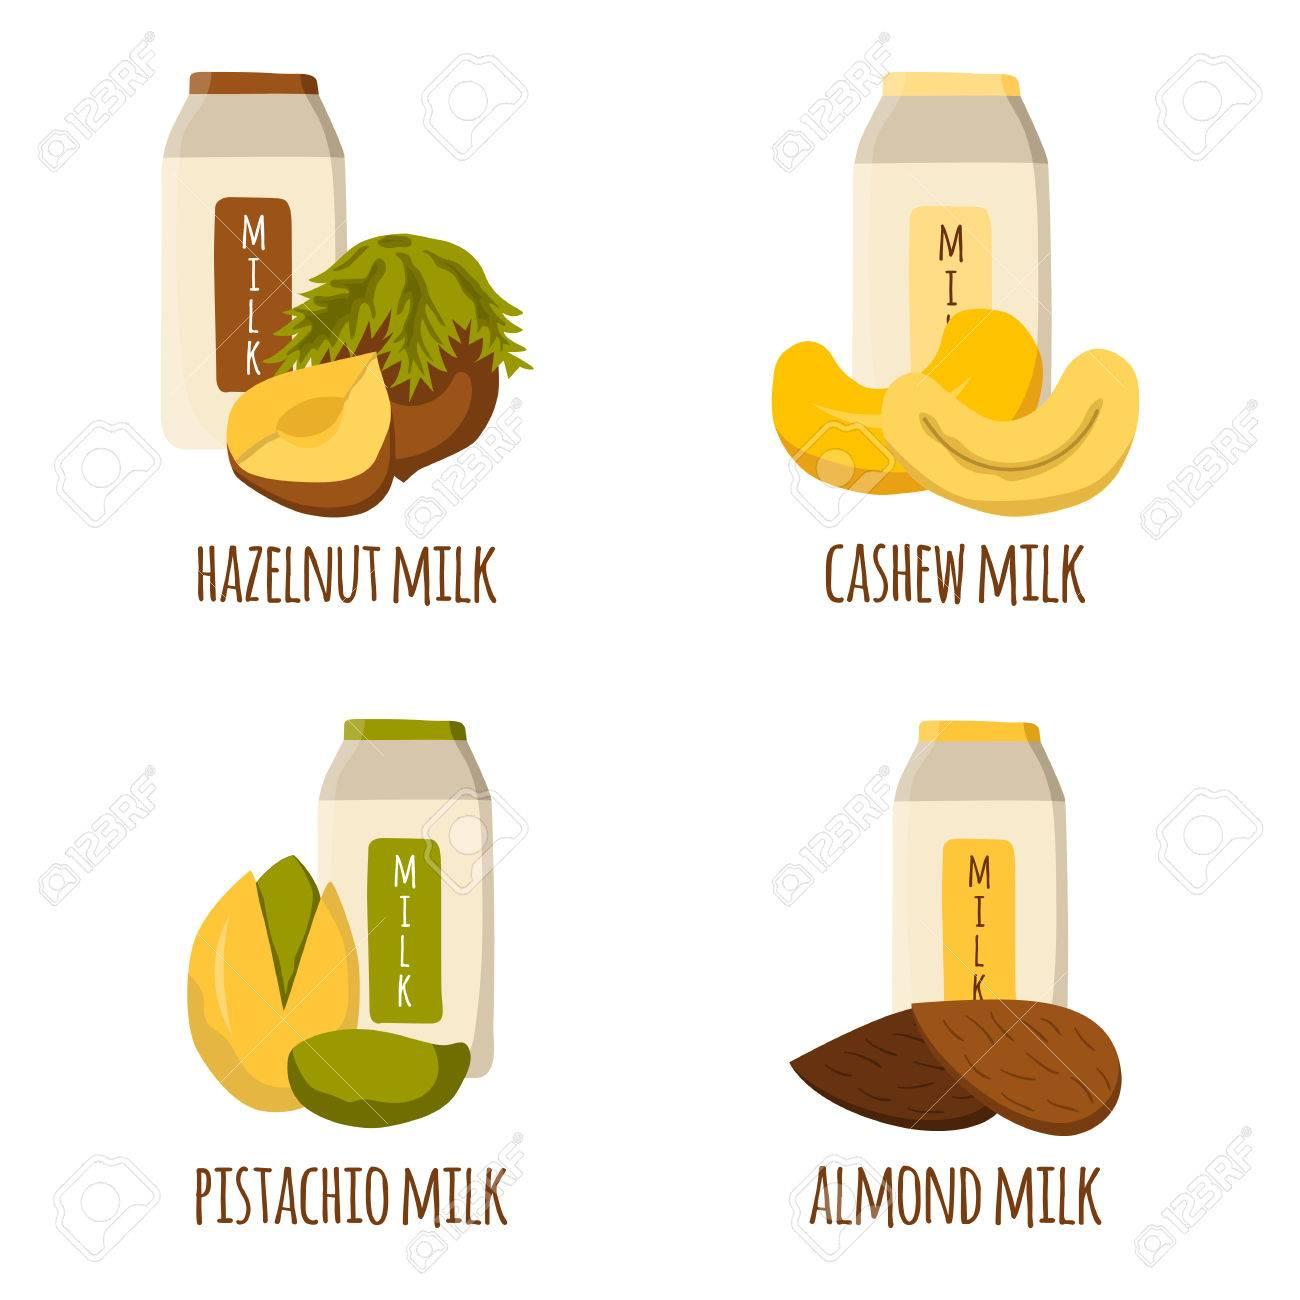 Vector cartoon illustration with nuts milk: almond milk, pistachio milk, cashew milk, hazelnut milk. Lactose free diary products. Vegan source of protein and calcium. Vegan menu. Alternative for milk - 56789866